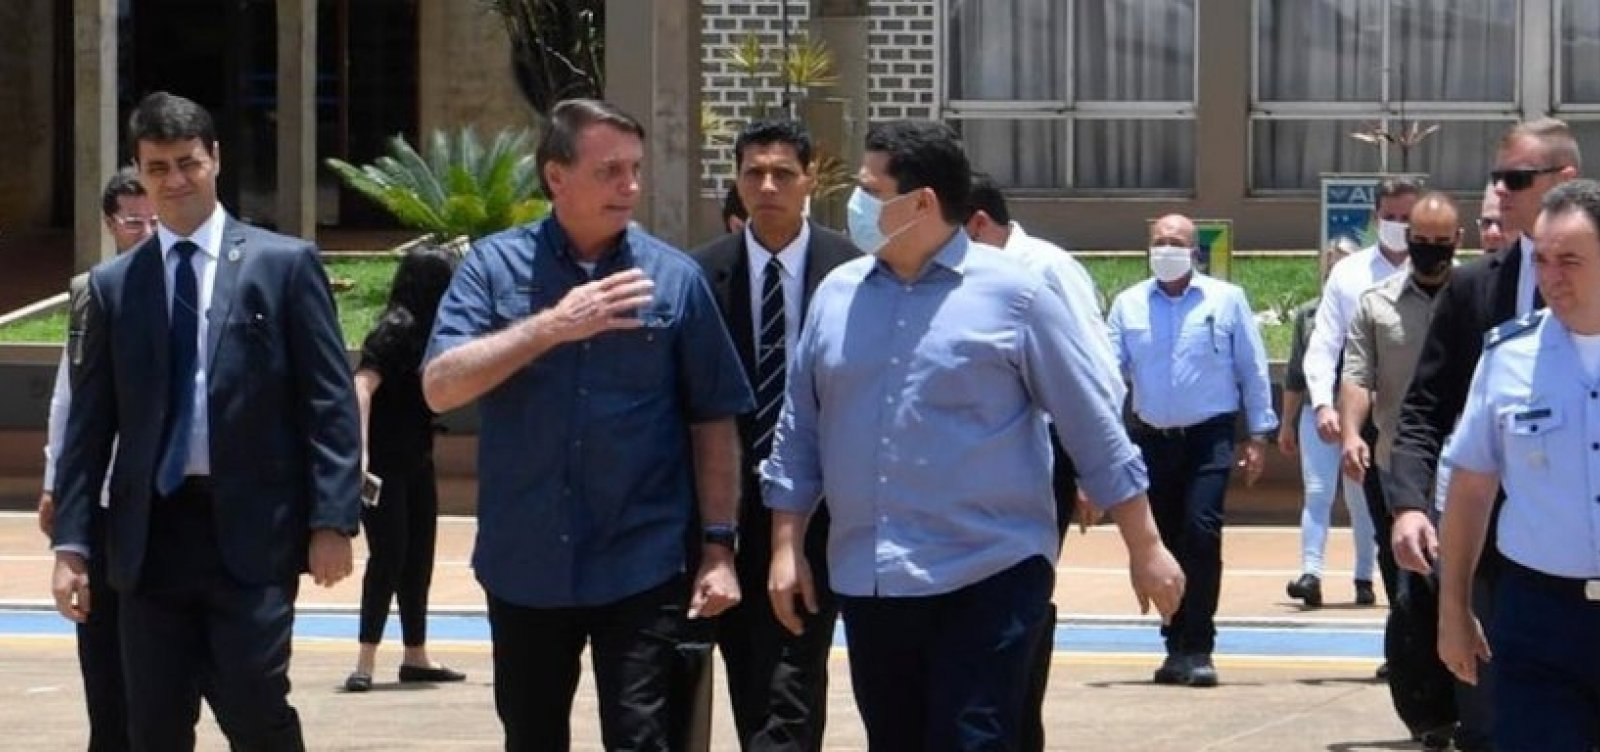 [Apagão: Bolsonaro assinará MP que isenta consumidores do Amapá de pagar conta de luz]